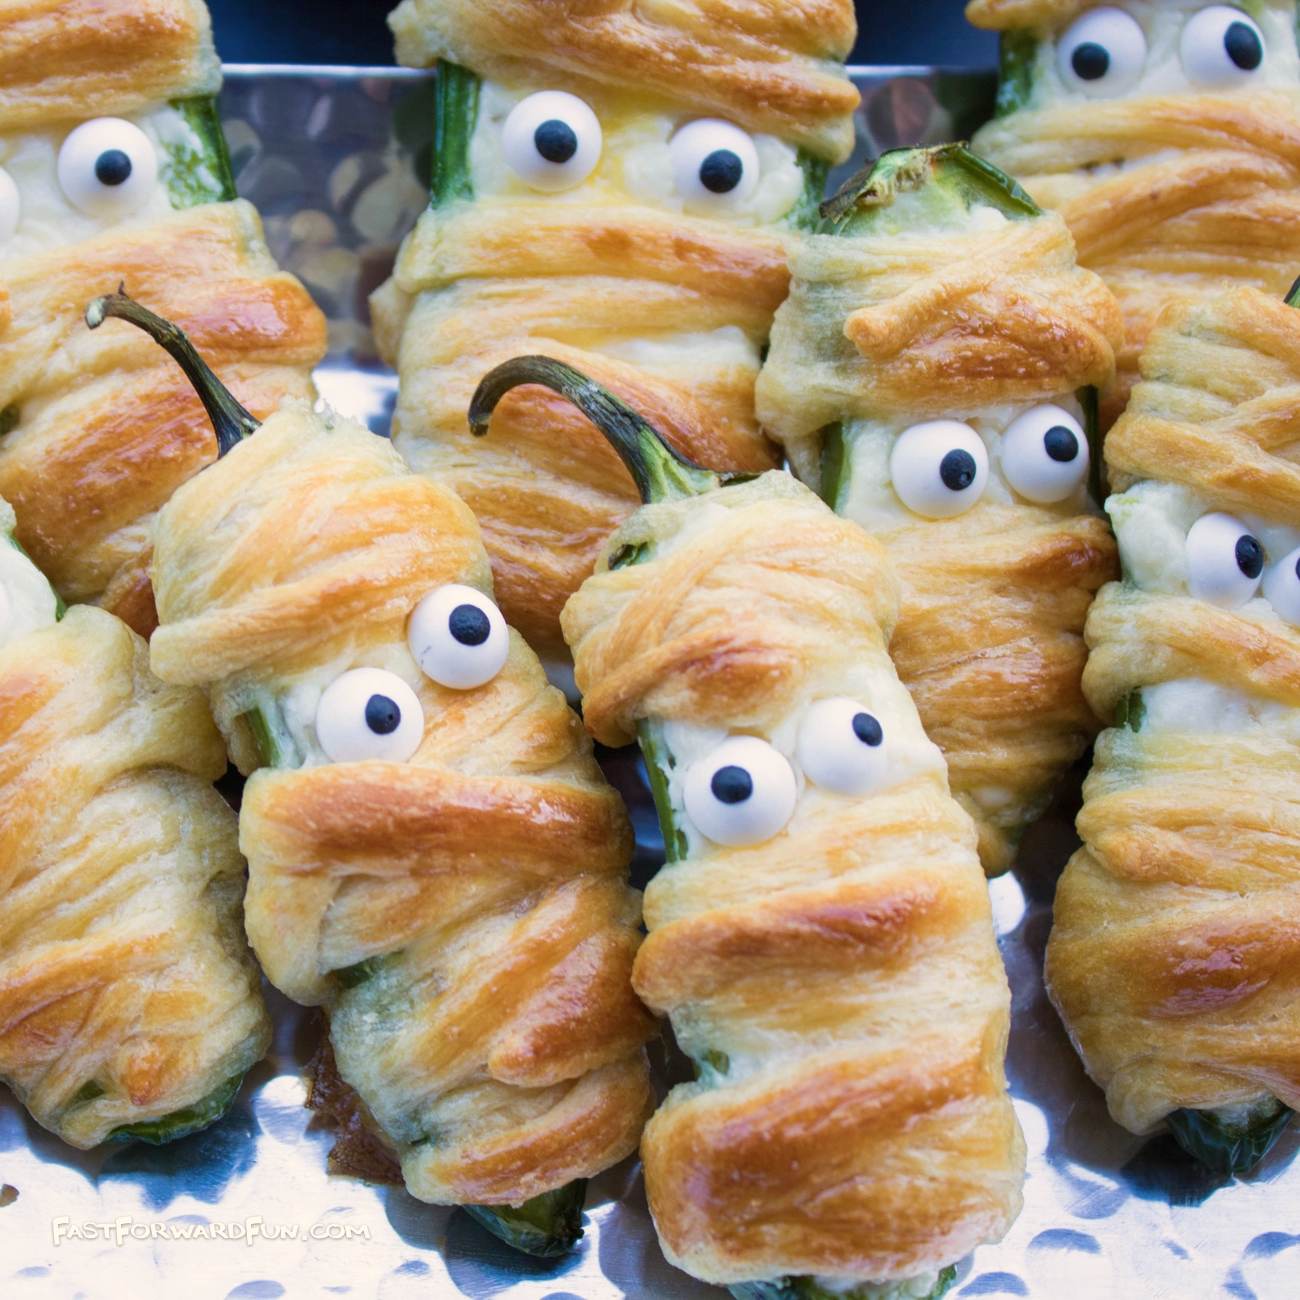 Jalapeño Popper Mummies (Easy & Fun Halloween Snack!)